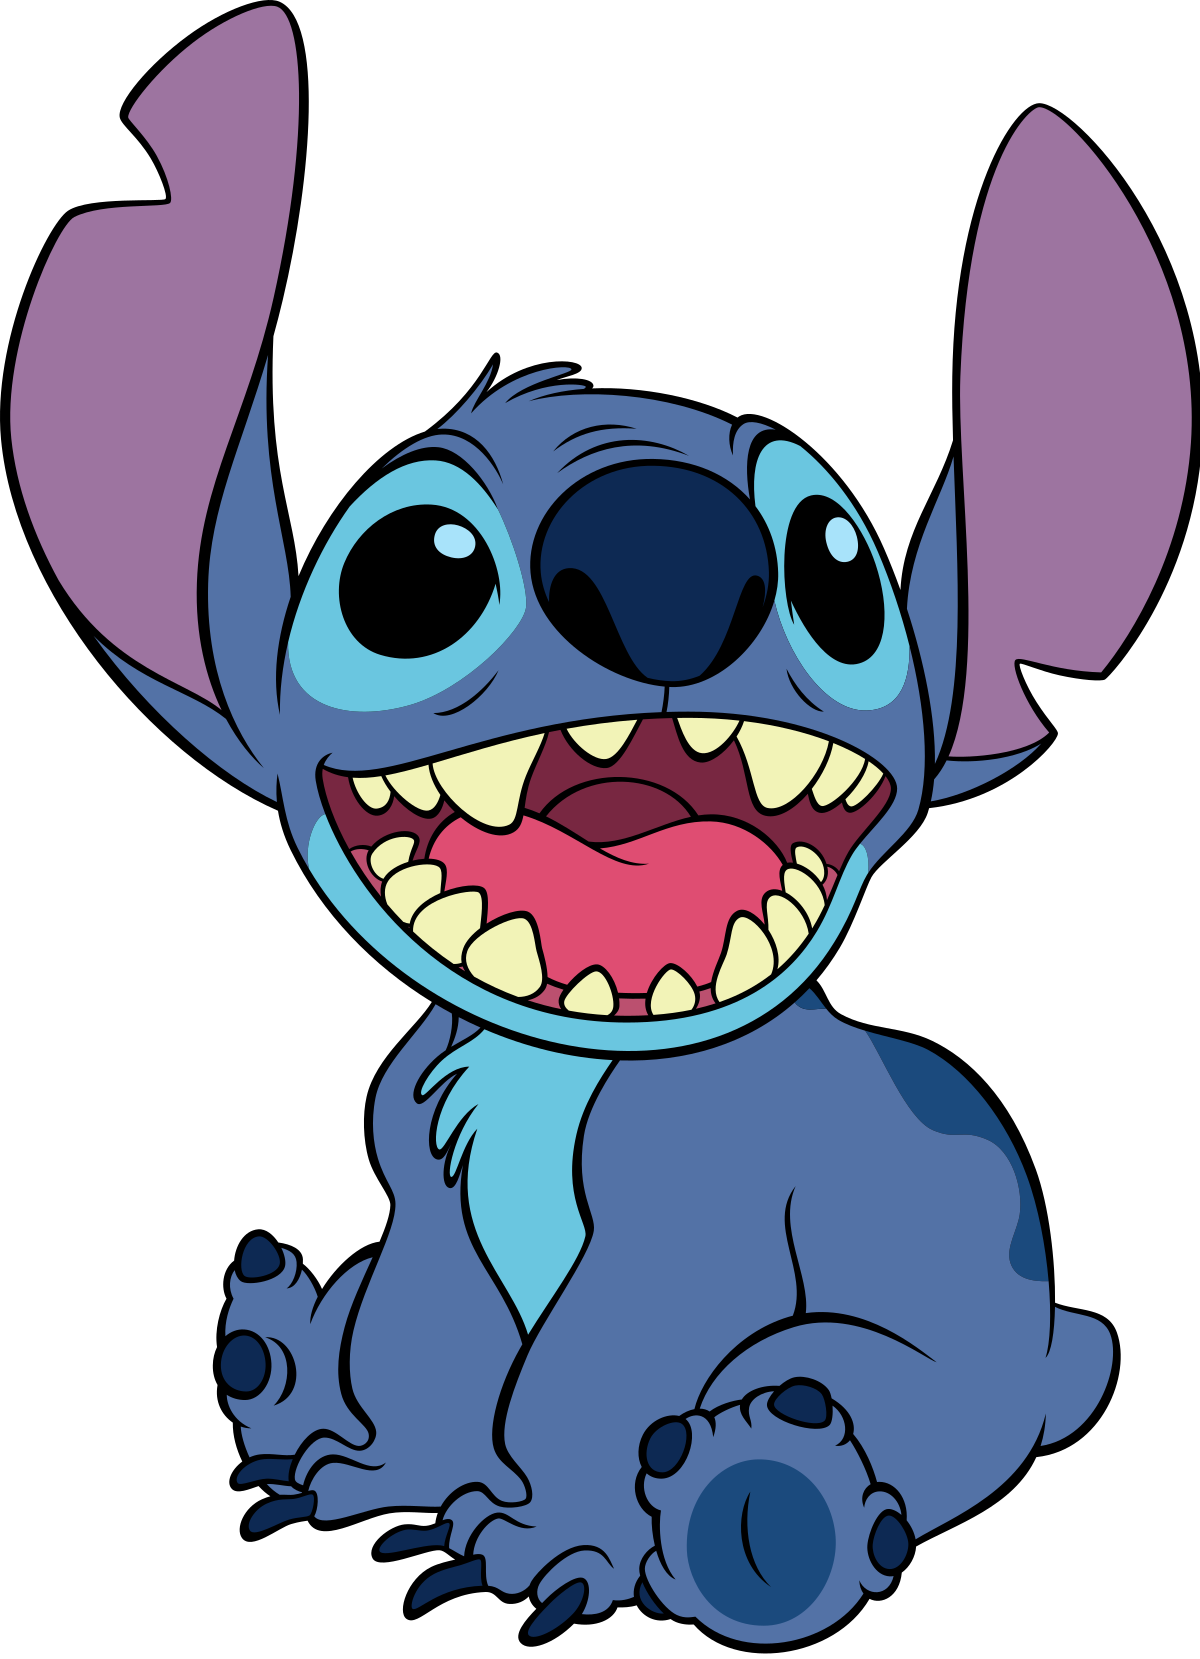 Disney wikipedia . Stitch clipart pelekai